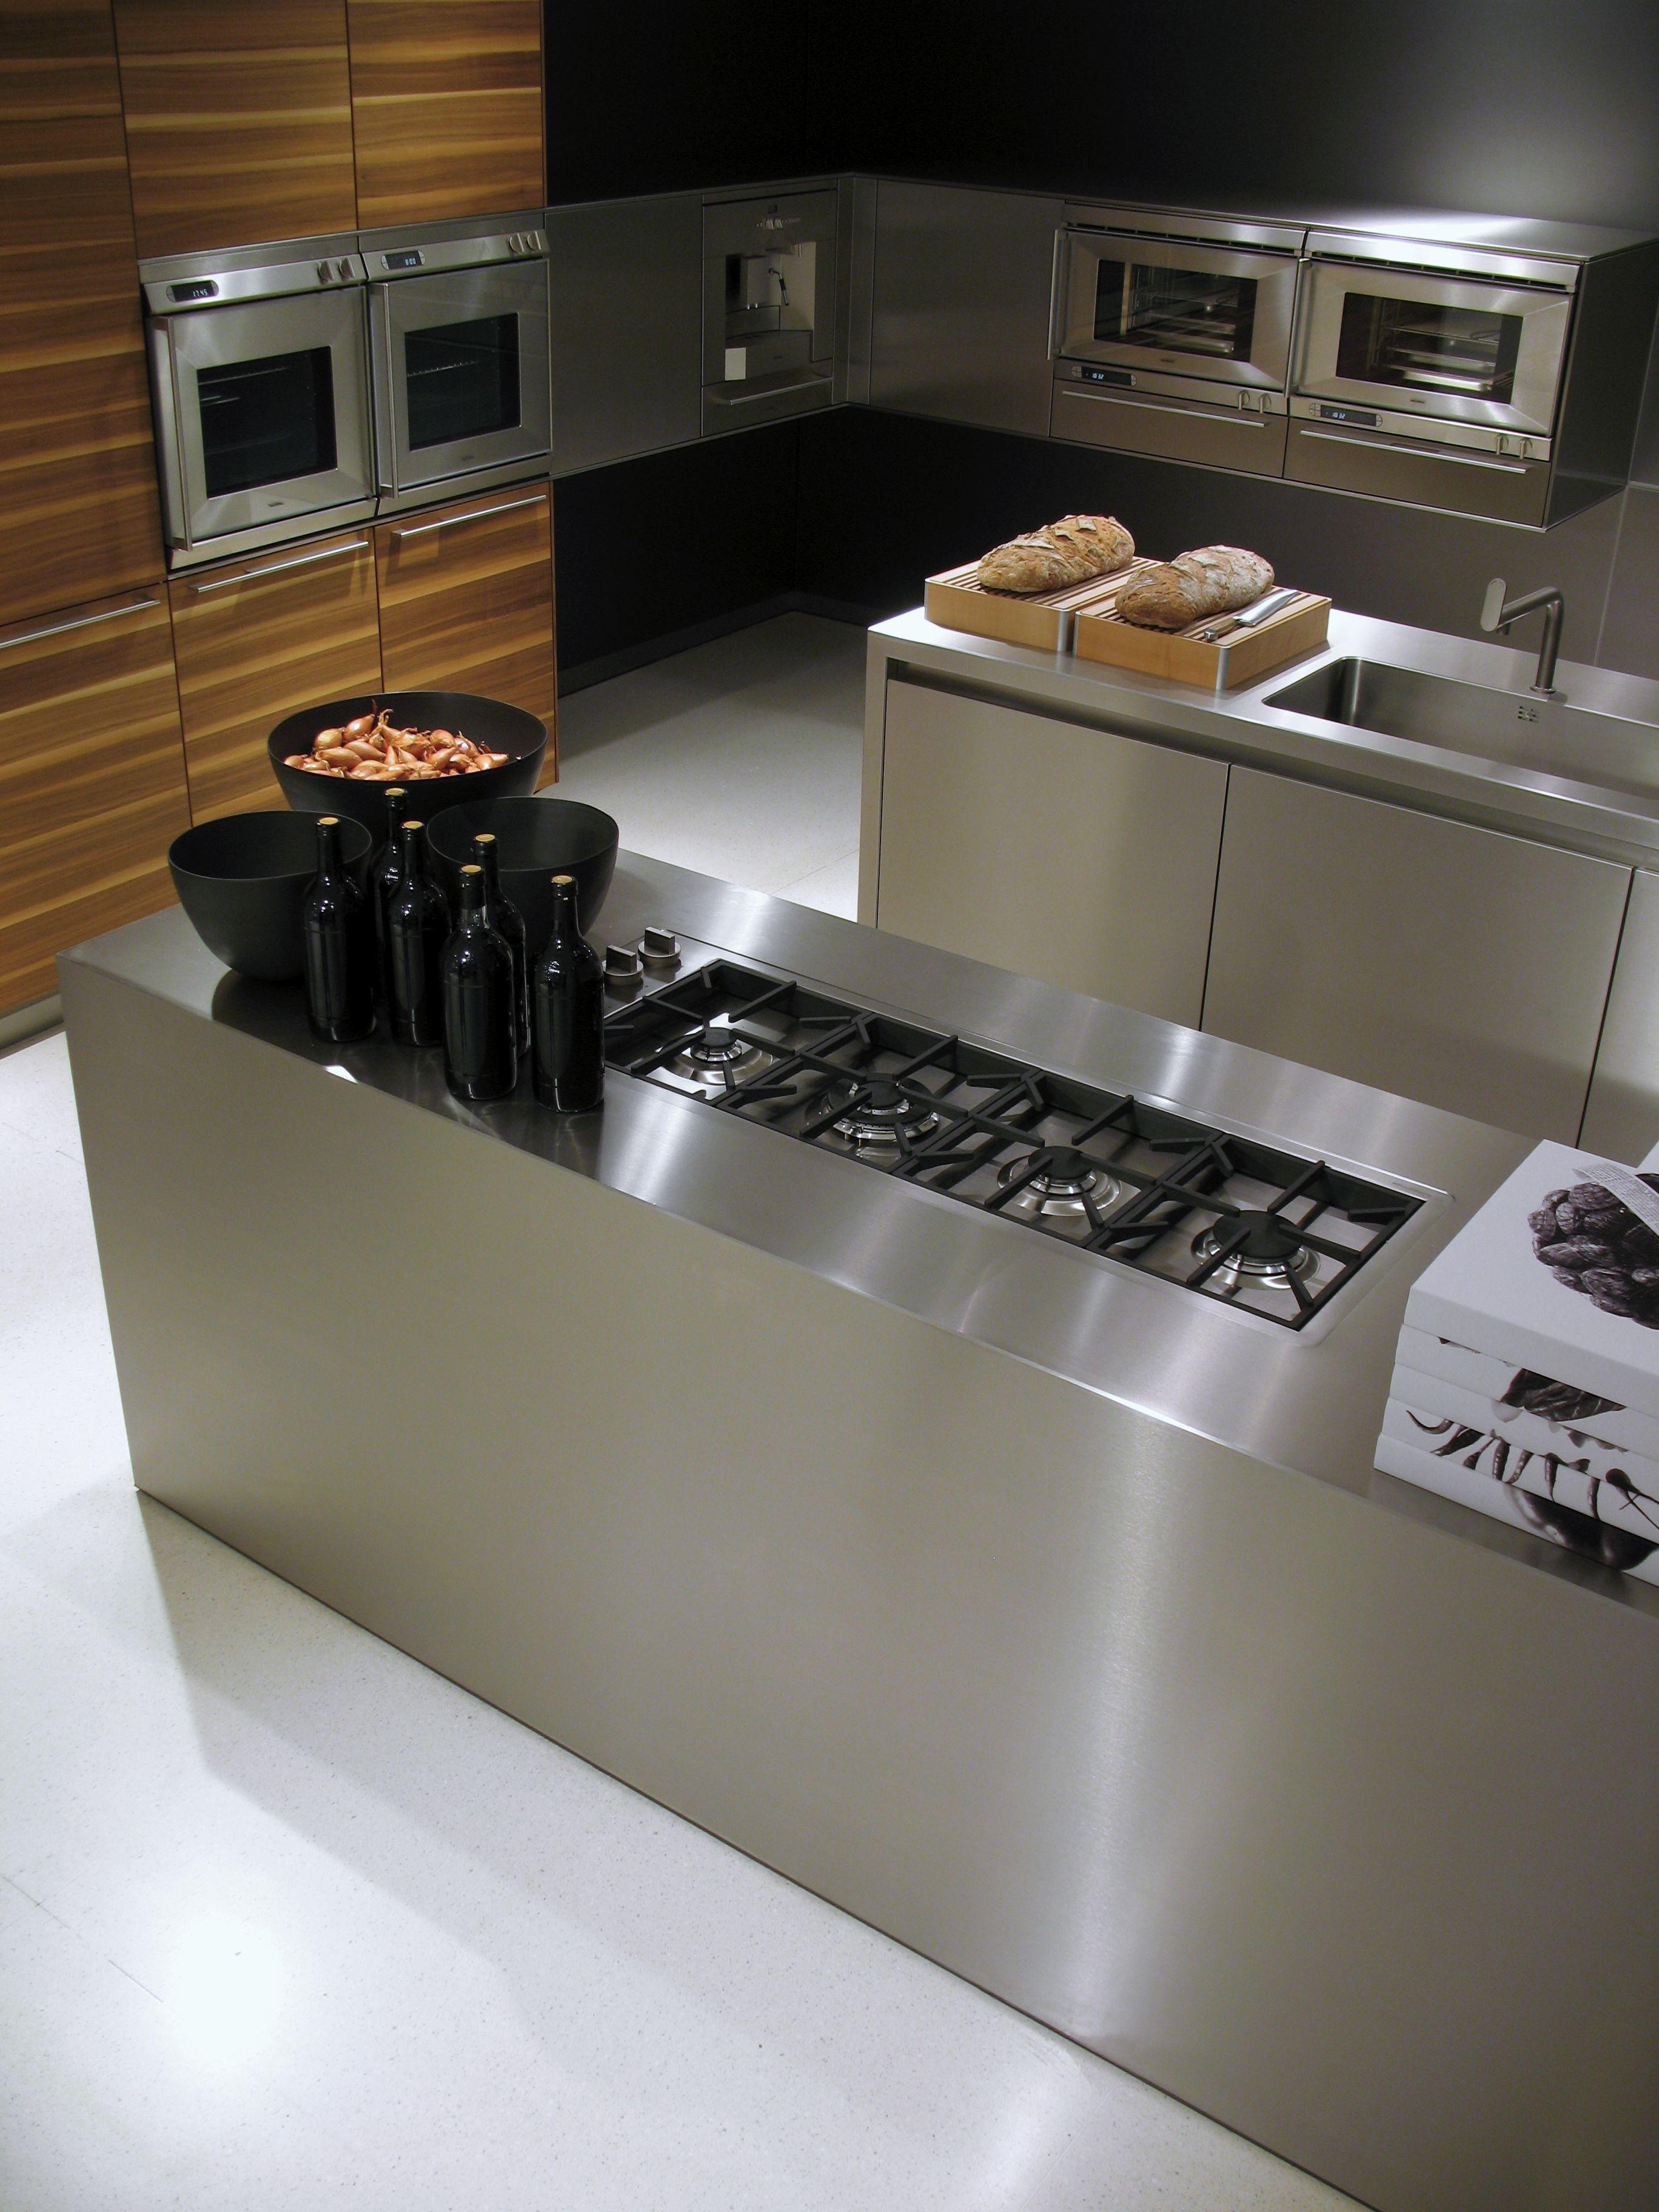 Stainless Steel Kitchen Island Countertop